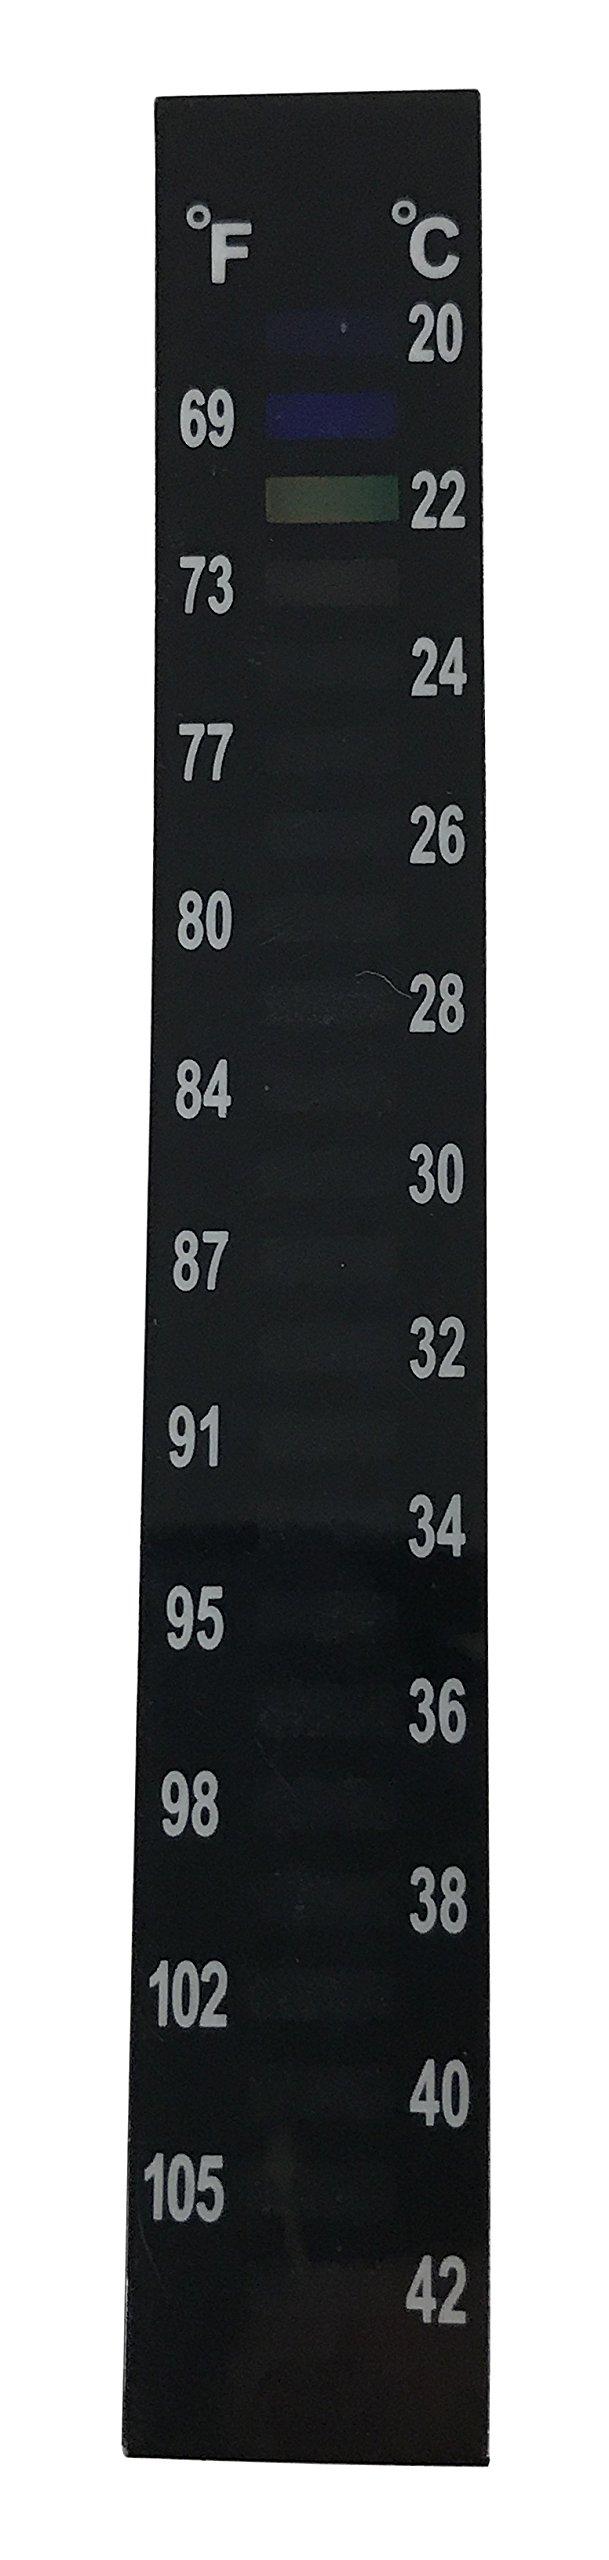 Penn Plax Reptile High Range Digital Thermometer